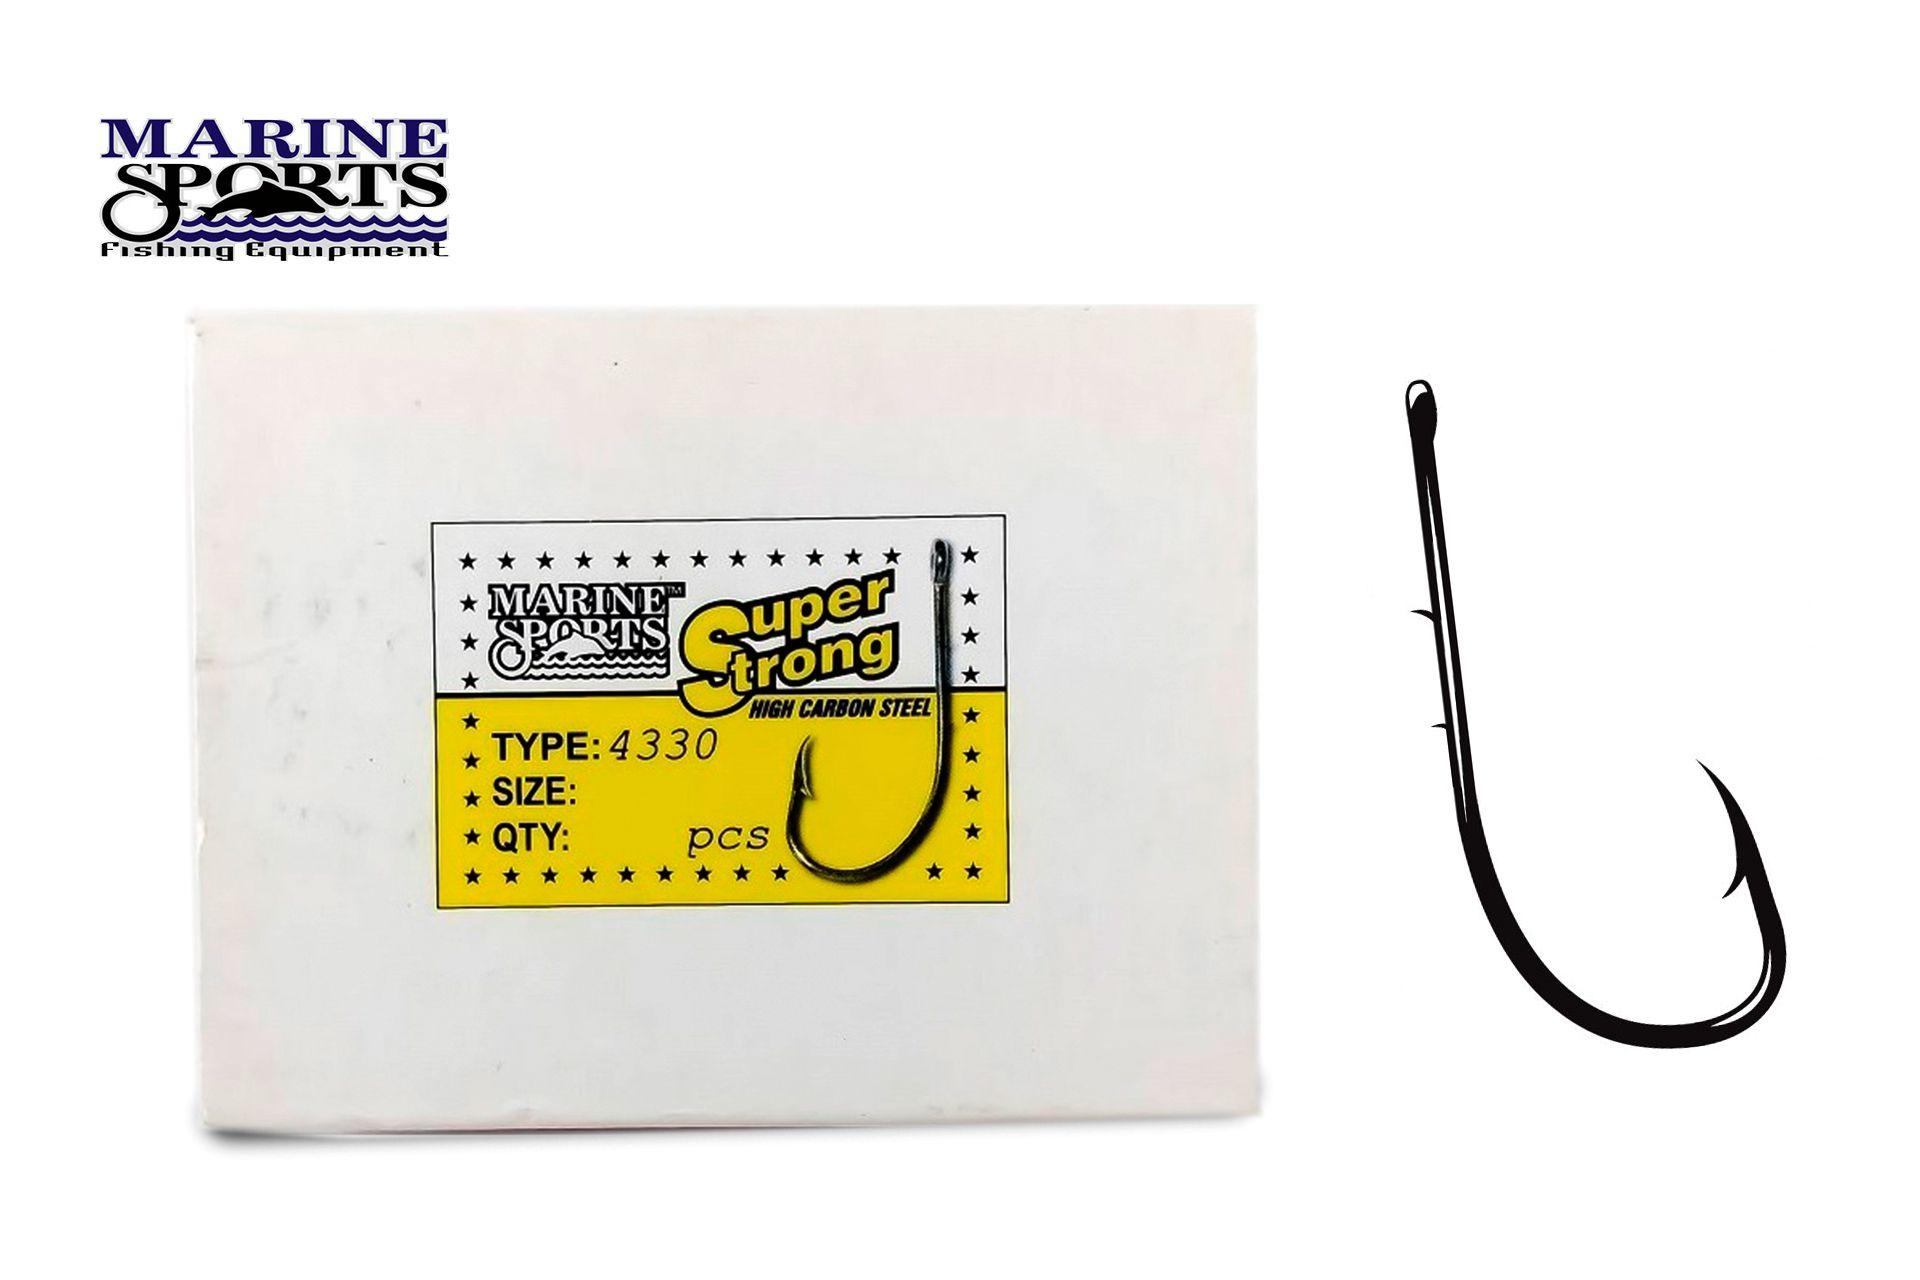 Anzol Marine Sports Super Strong 4330 N° 11/0 (8,2cm) C/ Farpas - 50 Peças